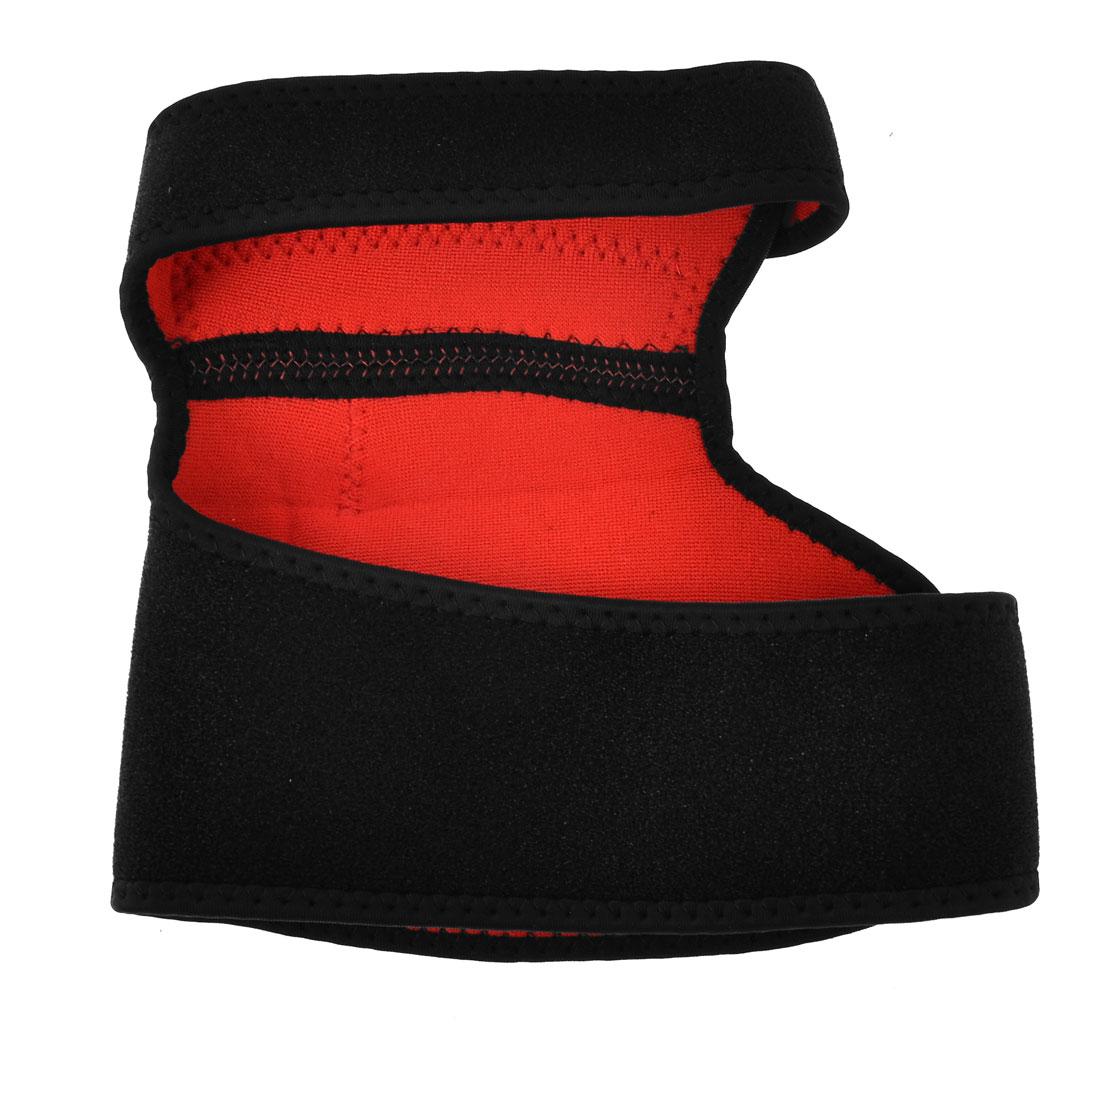 Adjustable Strap Sports Knee Support Brace Sleeve Wrap Black Red